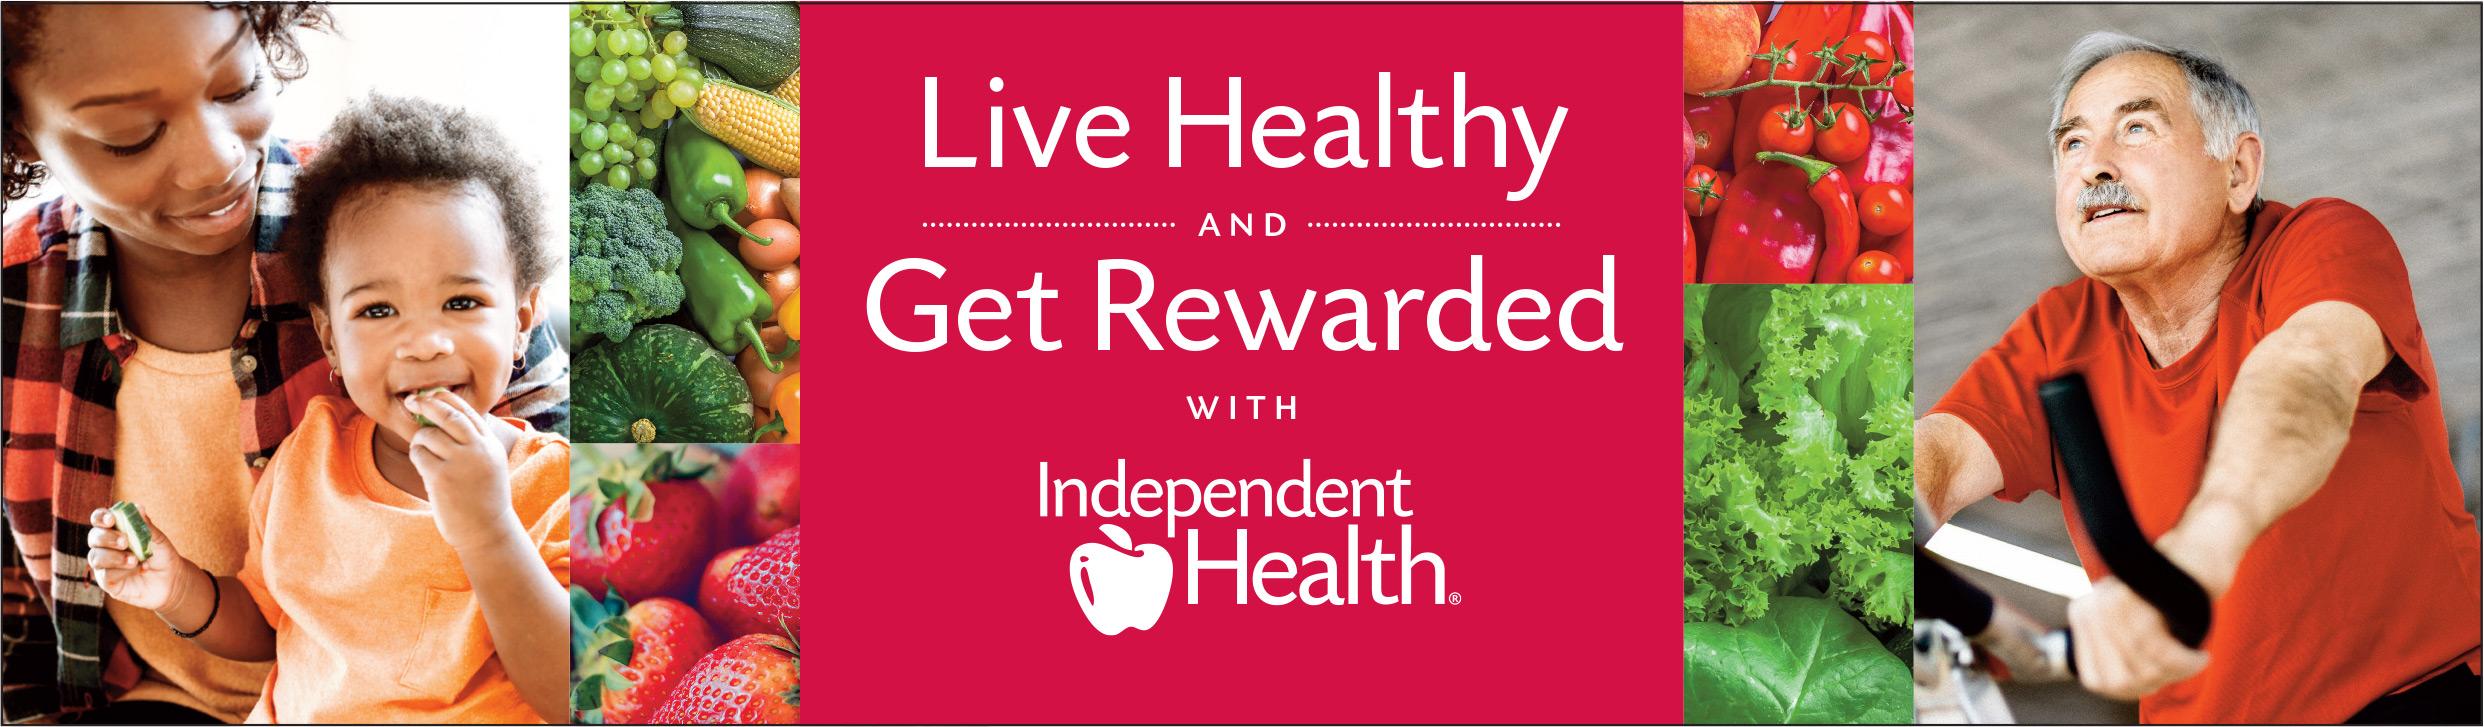 Independent Health Header